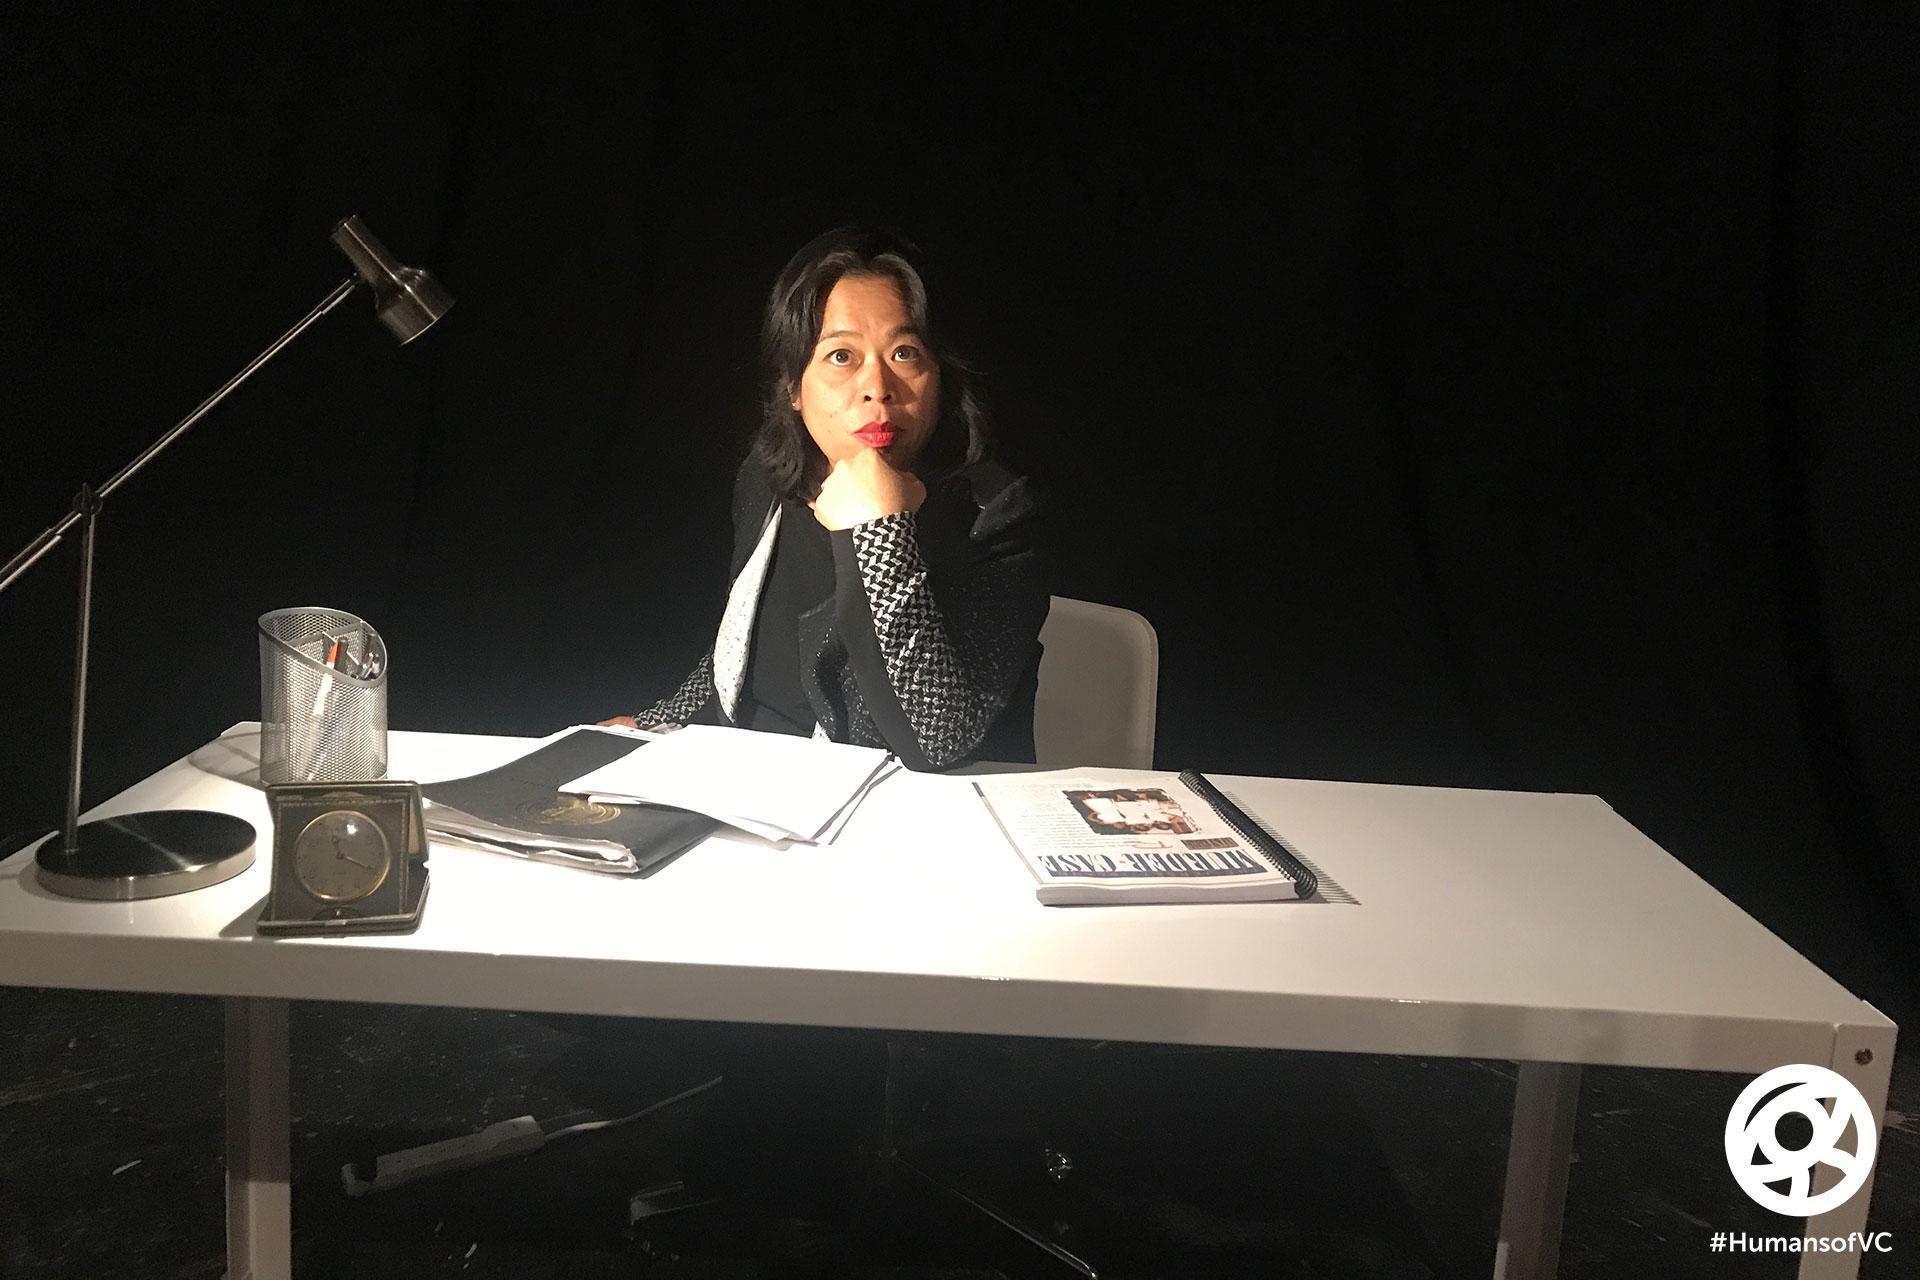 Celine Parreñas Shimizu, Filmmaker